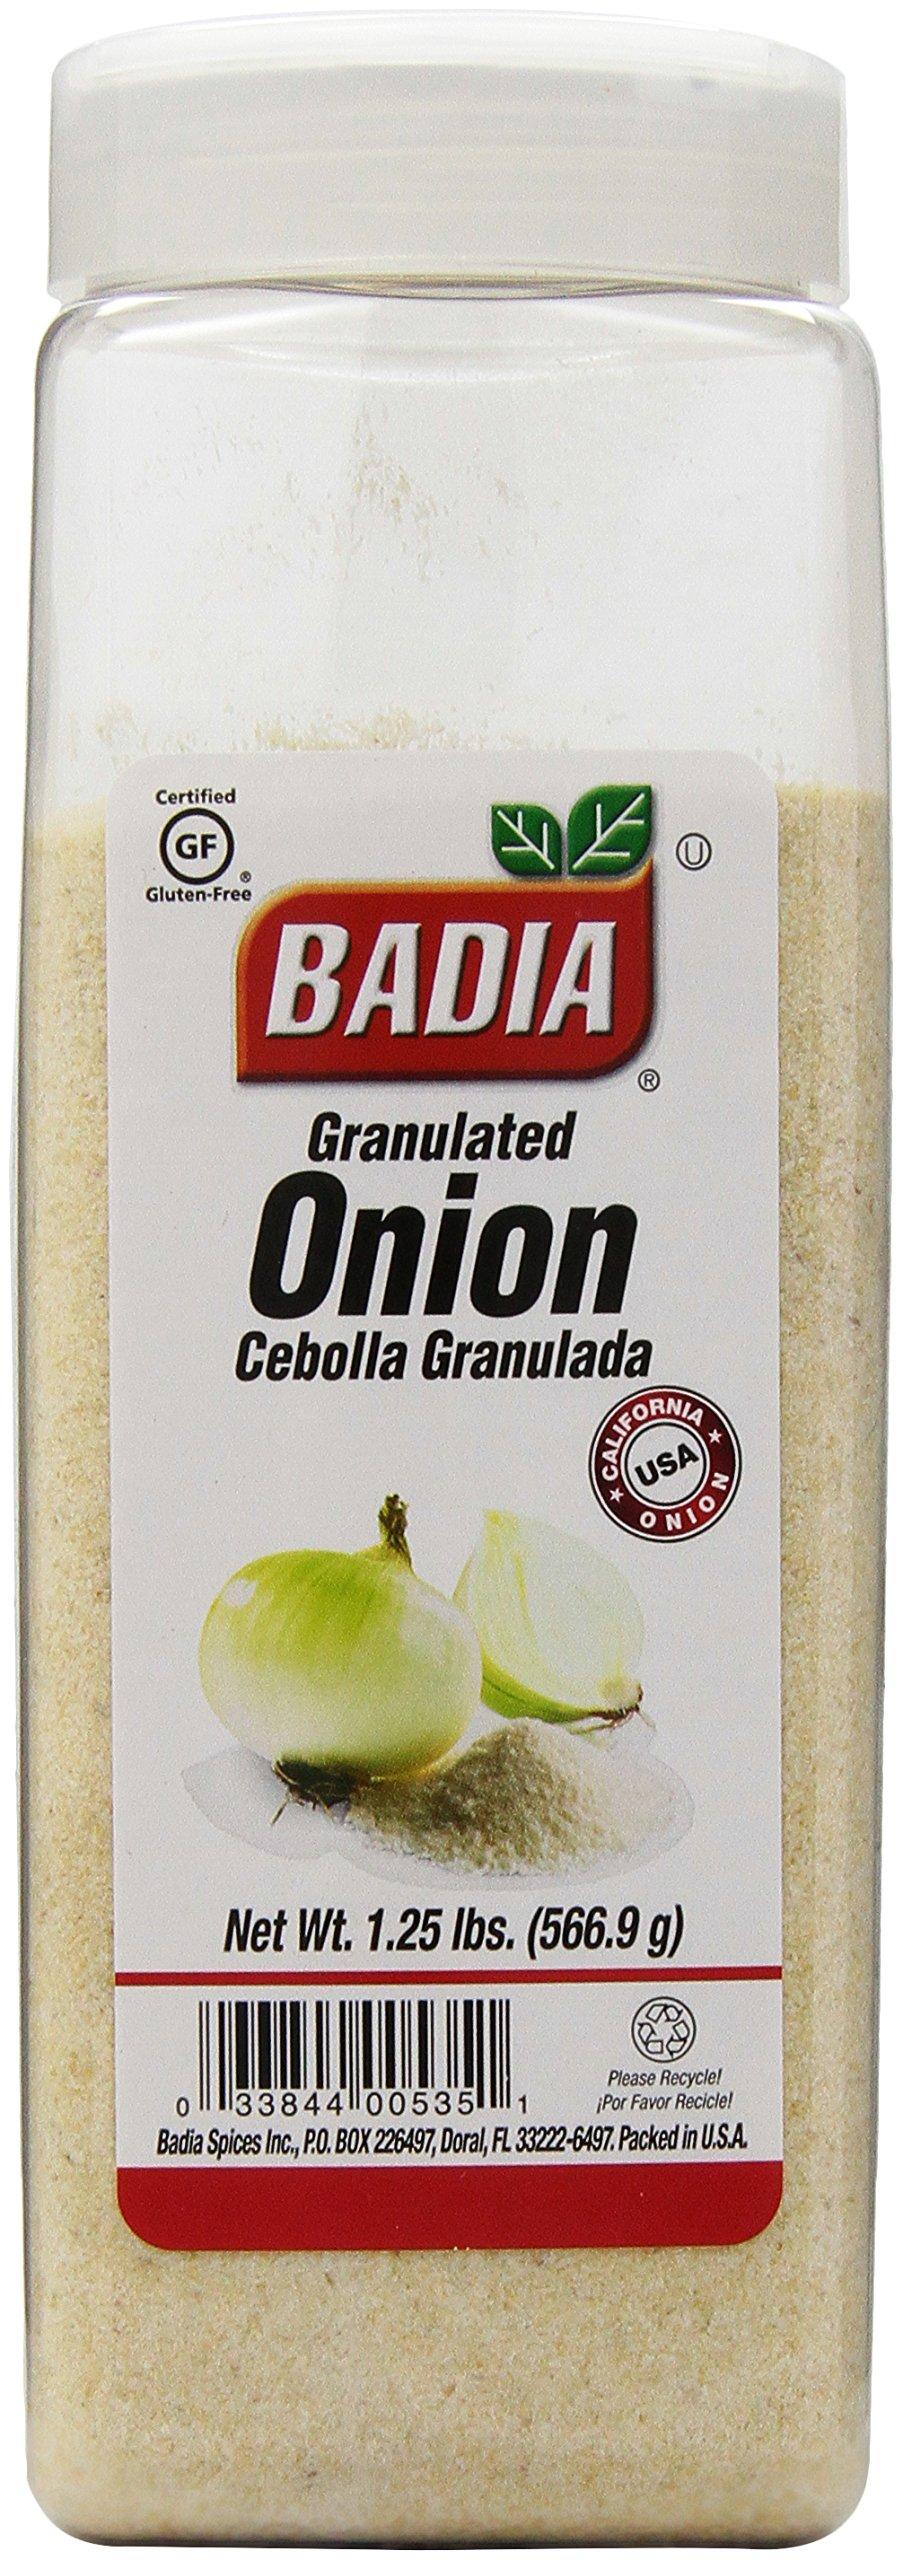 Badia Onion Granulated, 1.25 Pound (Pack of 6)